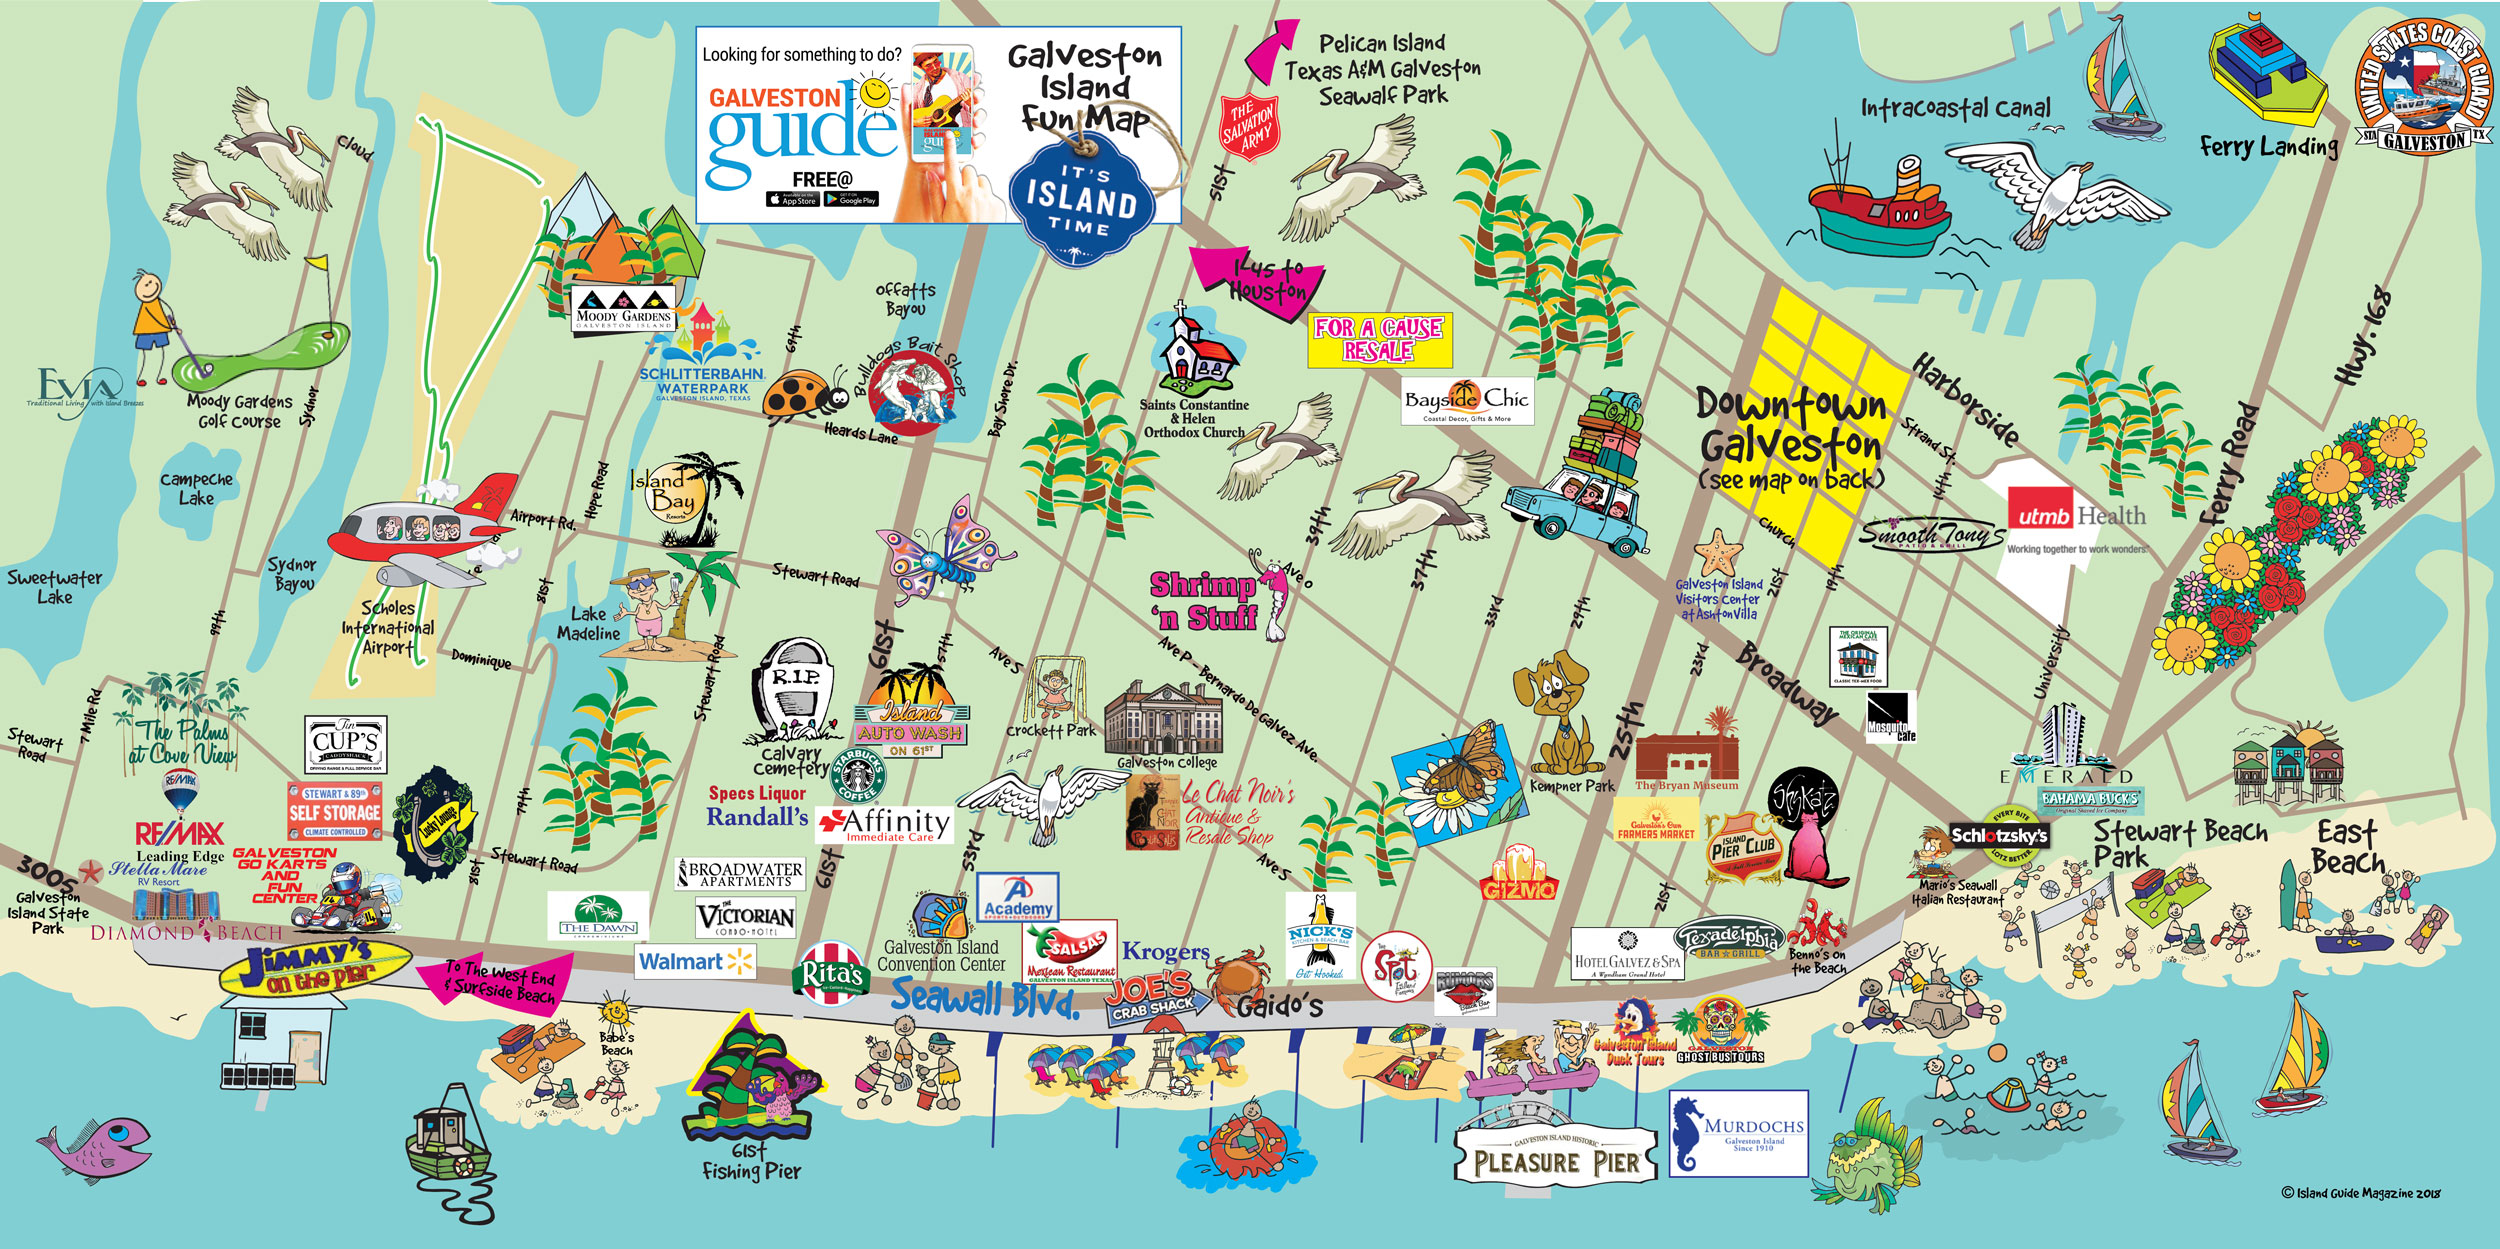 Galveston Fun Maps Galveston Island Guide